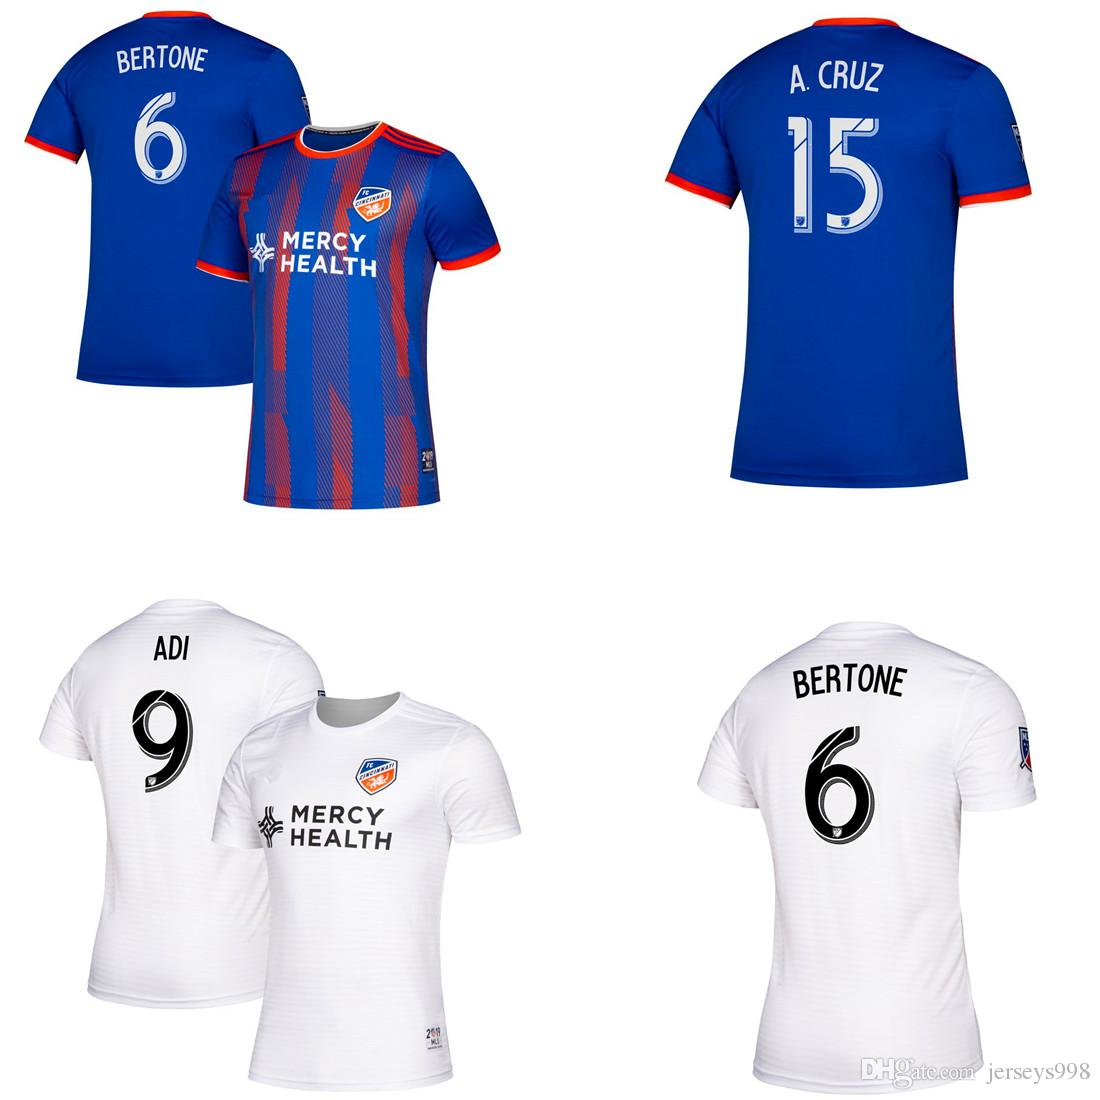 online store 03c61 50cfd 2019 2020 FC Cincinnati soccer jersey 19 20 Thai quality MLS GARZA WASTON  BERTONE ADI A.CRUZ football jerseys shirt